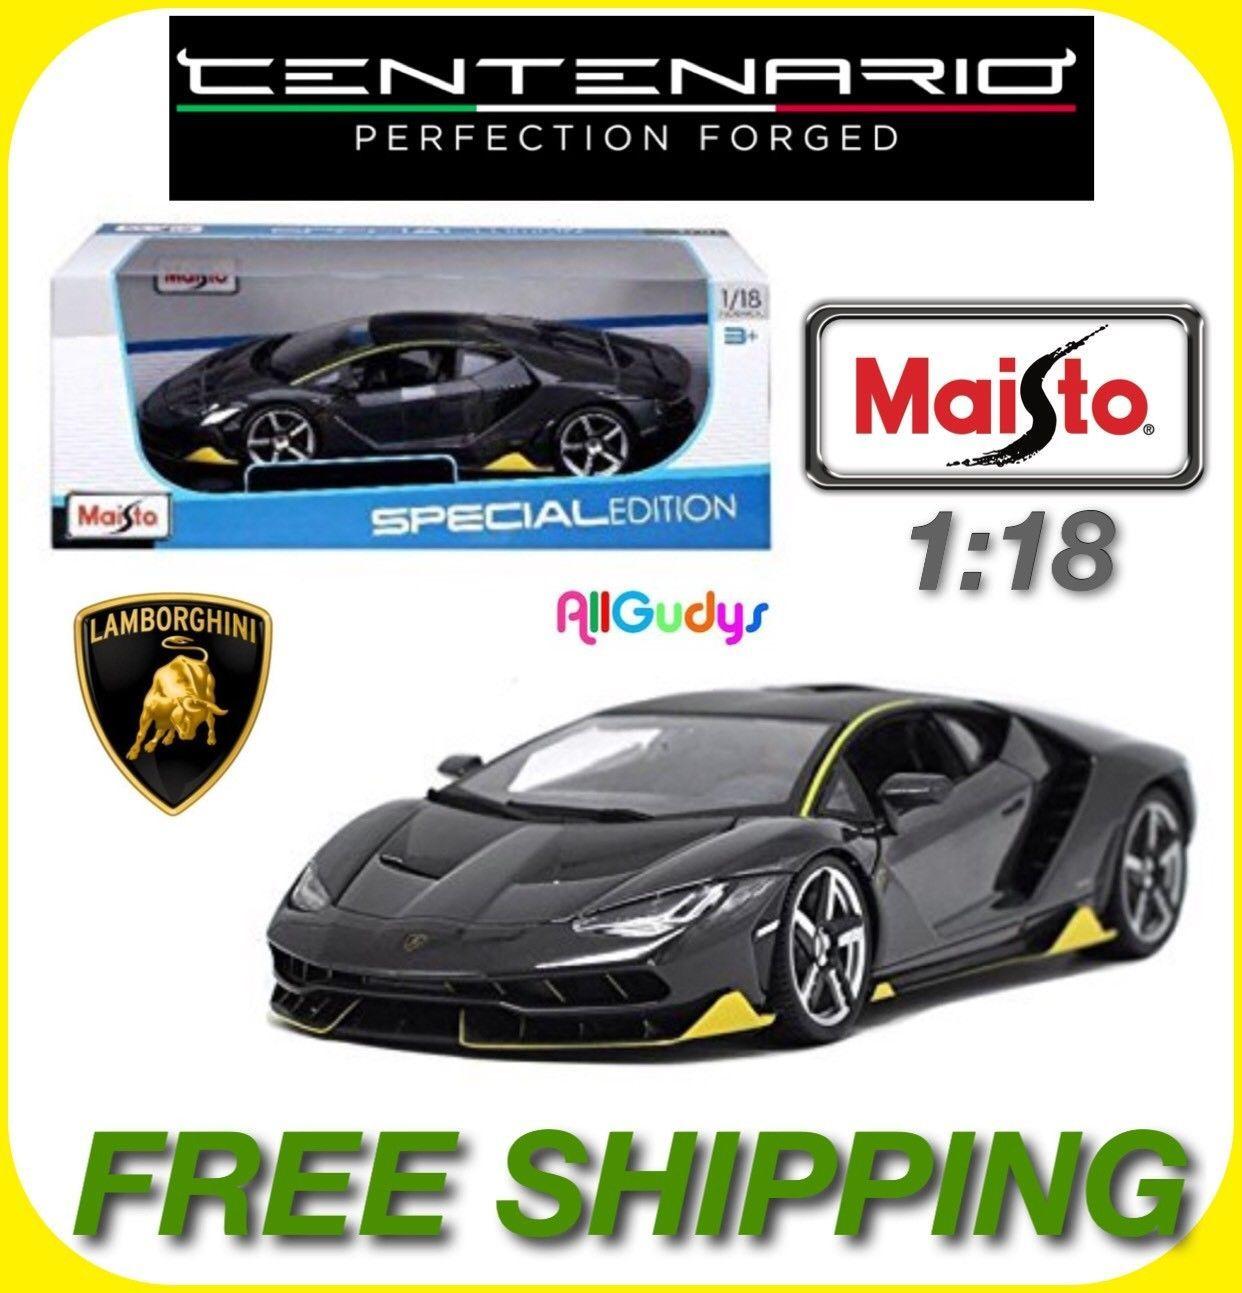 nice Amazing Maisto 1:18 Scale Diecast Model Car - Lamborghini ...